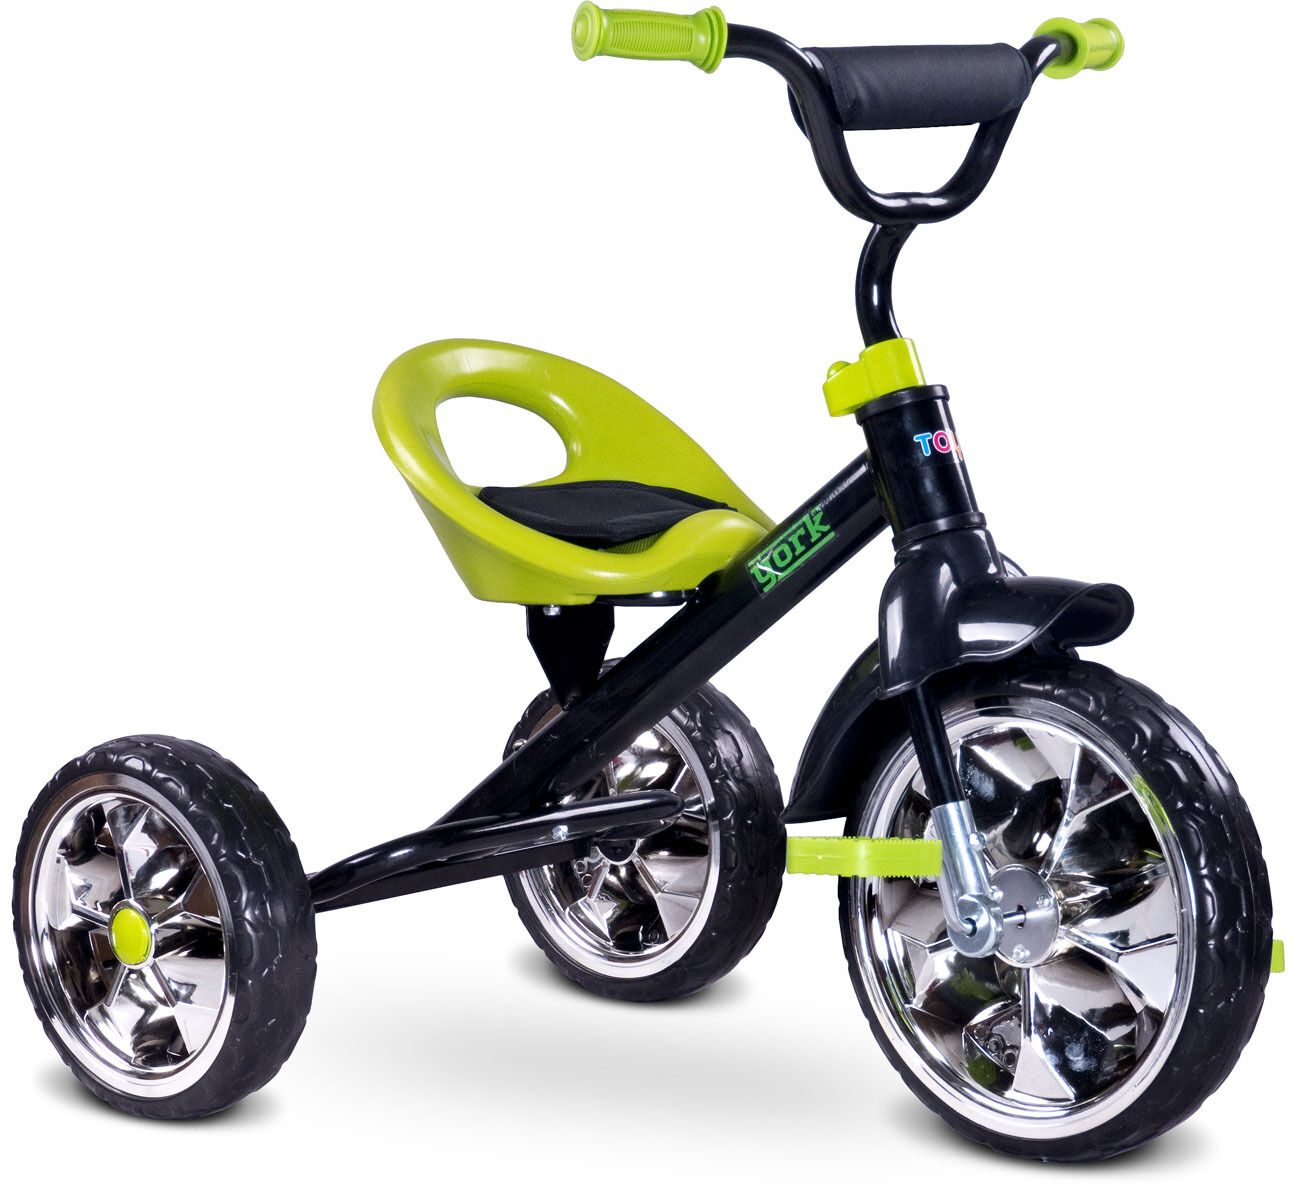 YORK Kinder Dreirad Kleinkinder Fahrrad Baby Rad Kinderdreirad Kinderrad TOYZ